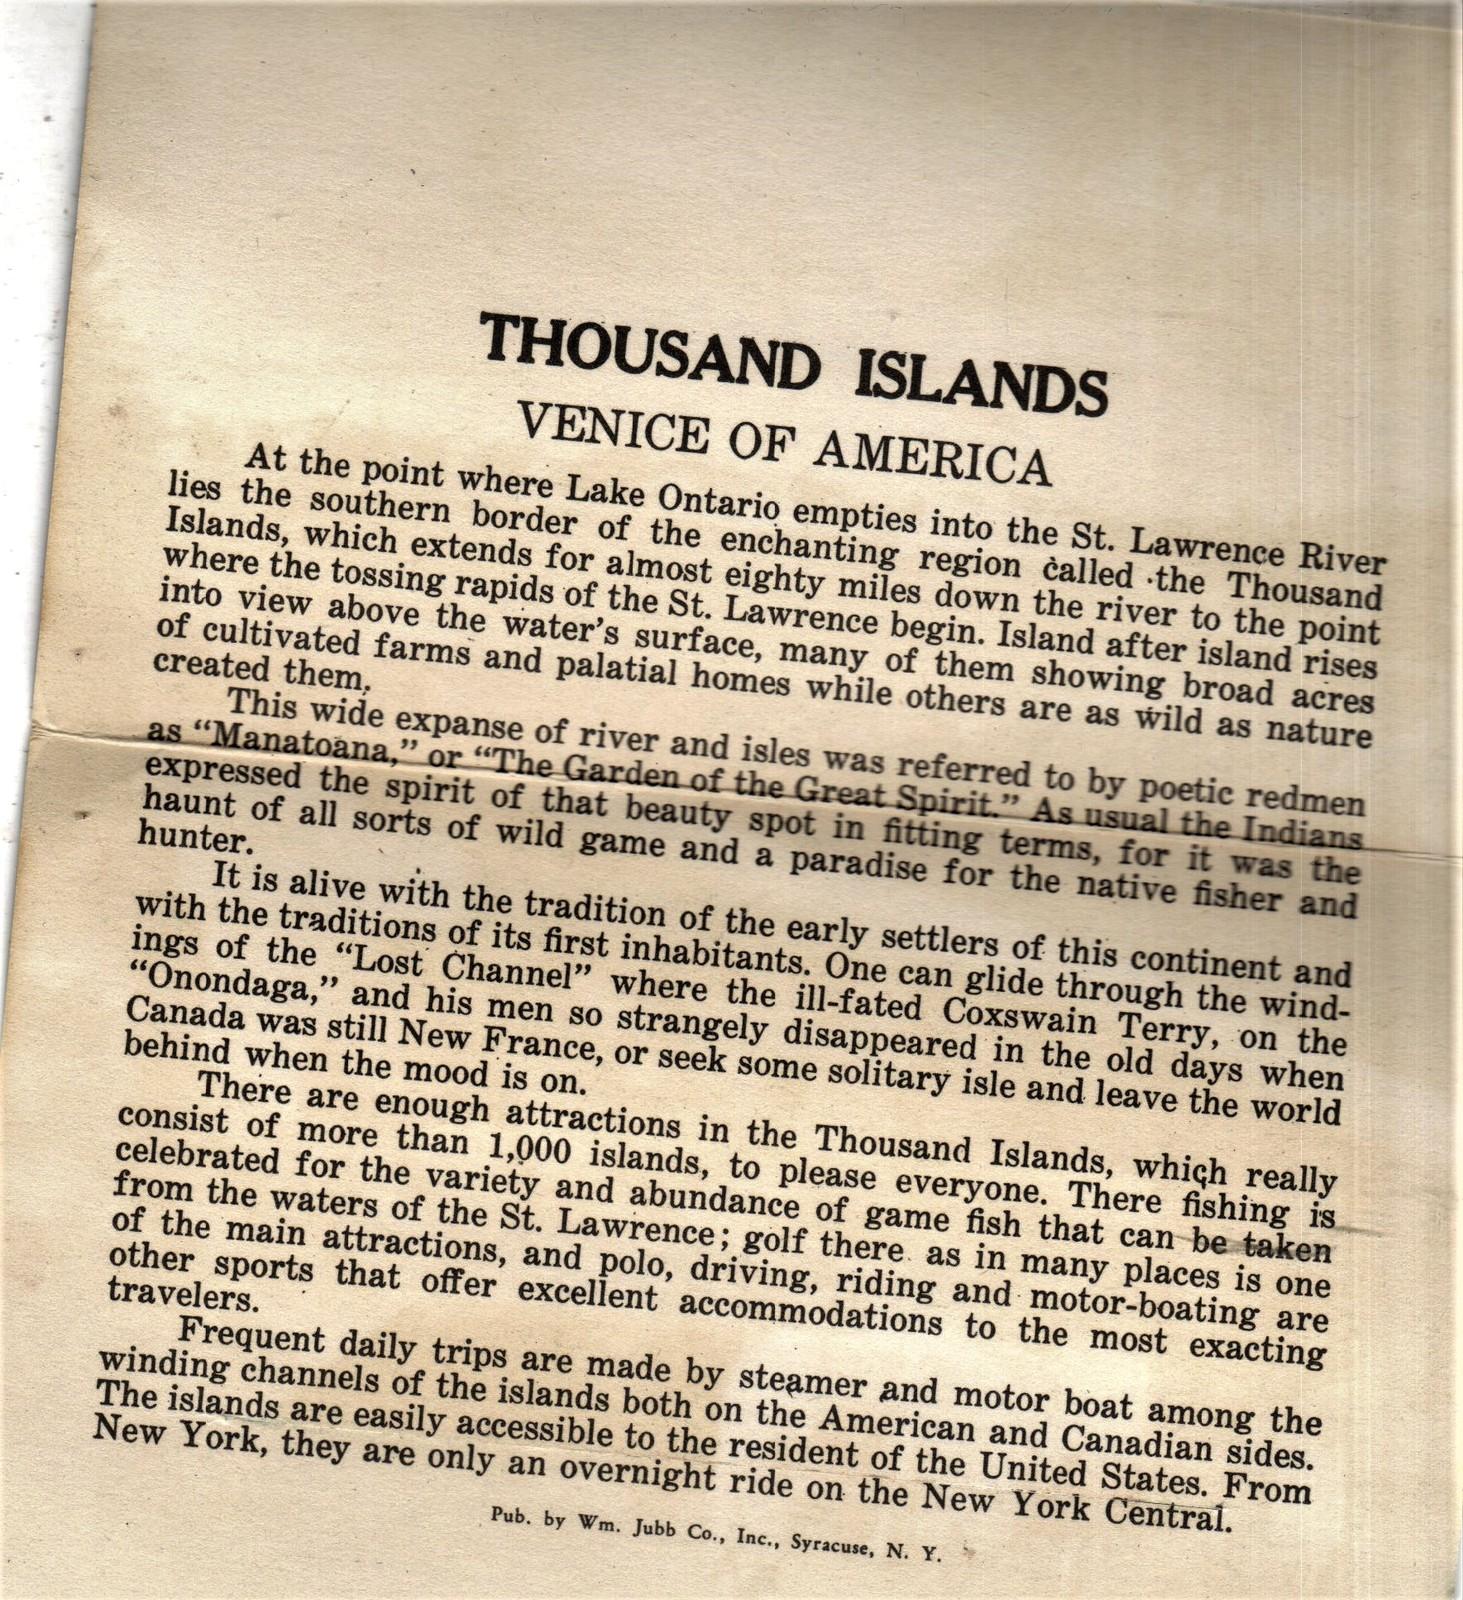 Thousand Islands Venice Of America Book & Souvenir Photo Booklet image 7